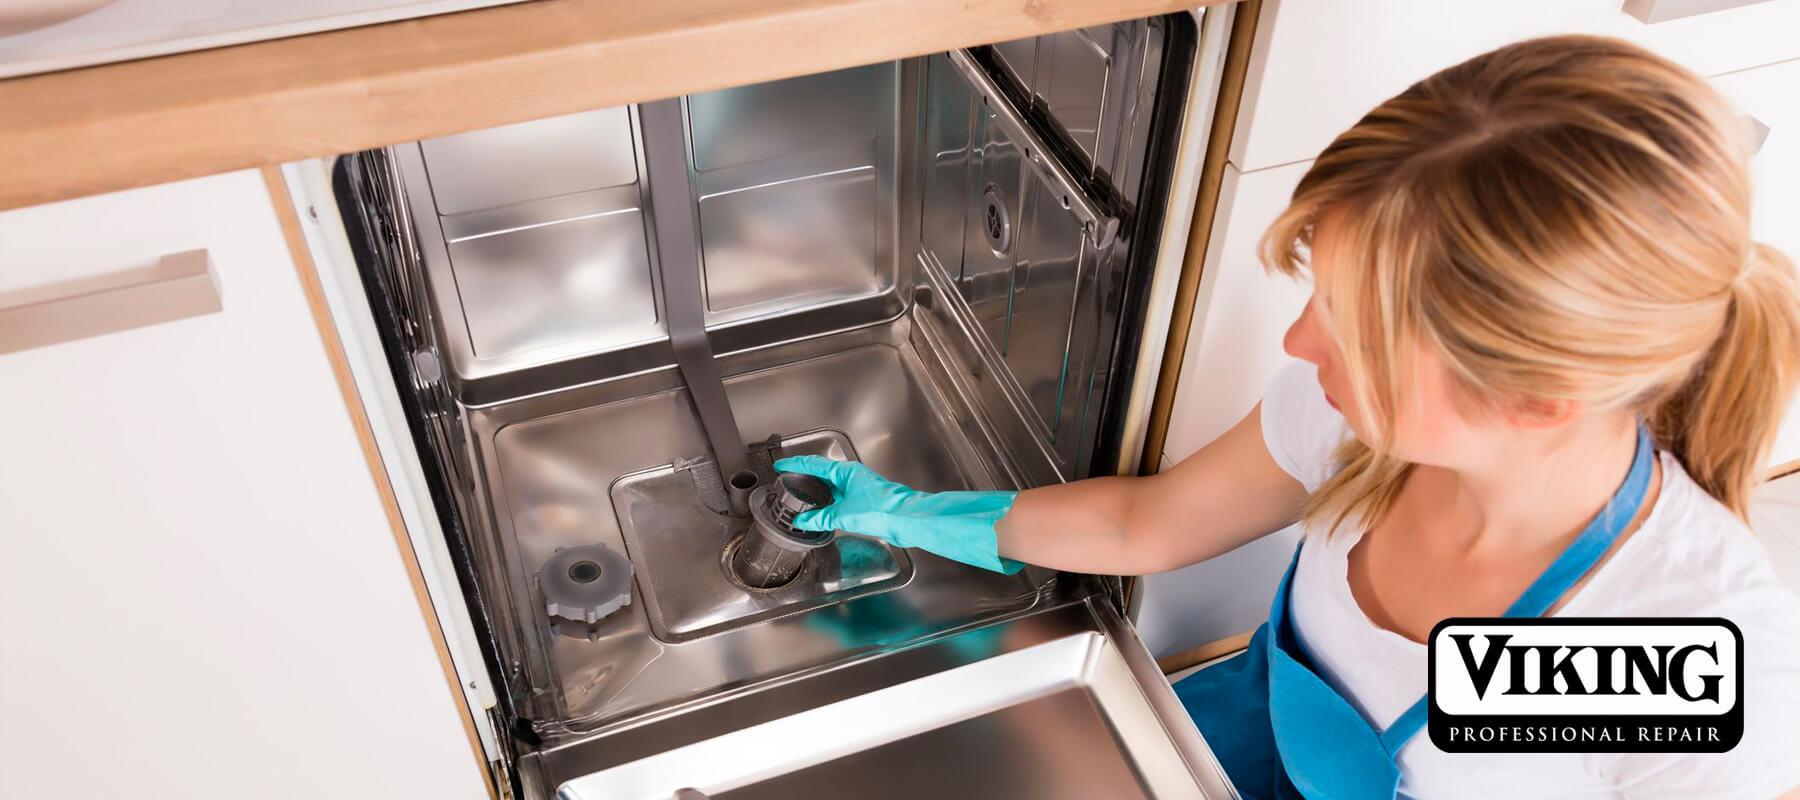 Authorized Viking Appliance Repair Service Palo Alto   Professional Viking Repair